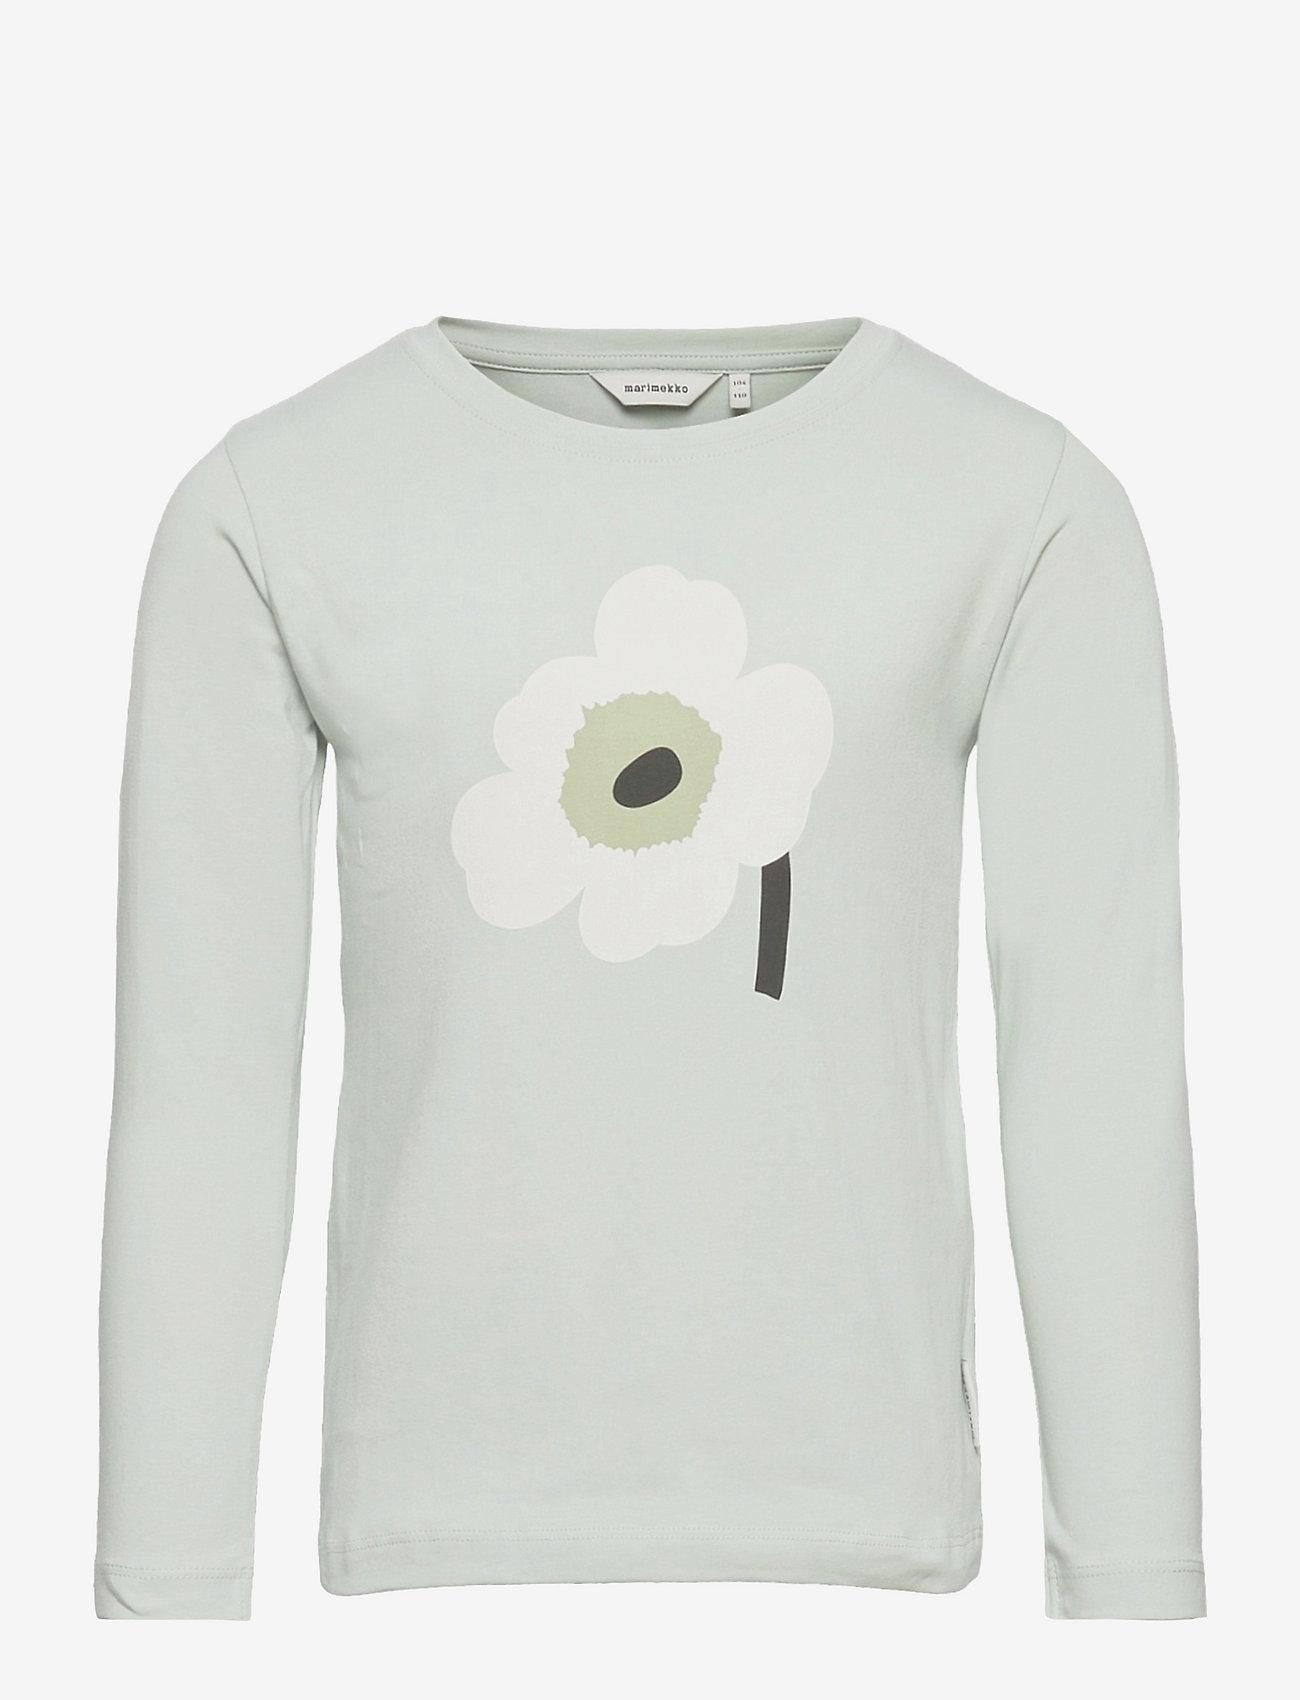 Marimekko - OULI UNIKKO PLACEMENT - langærmede t-shirts - light blue, off white, light green - 0